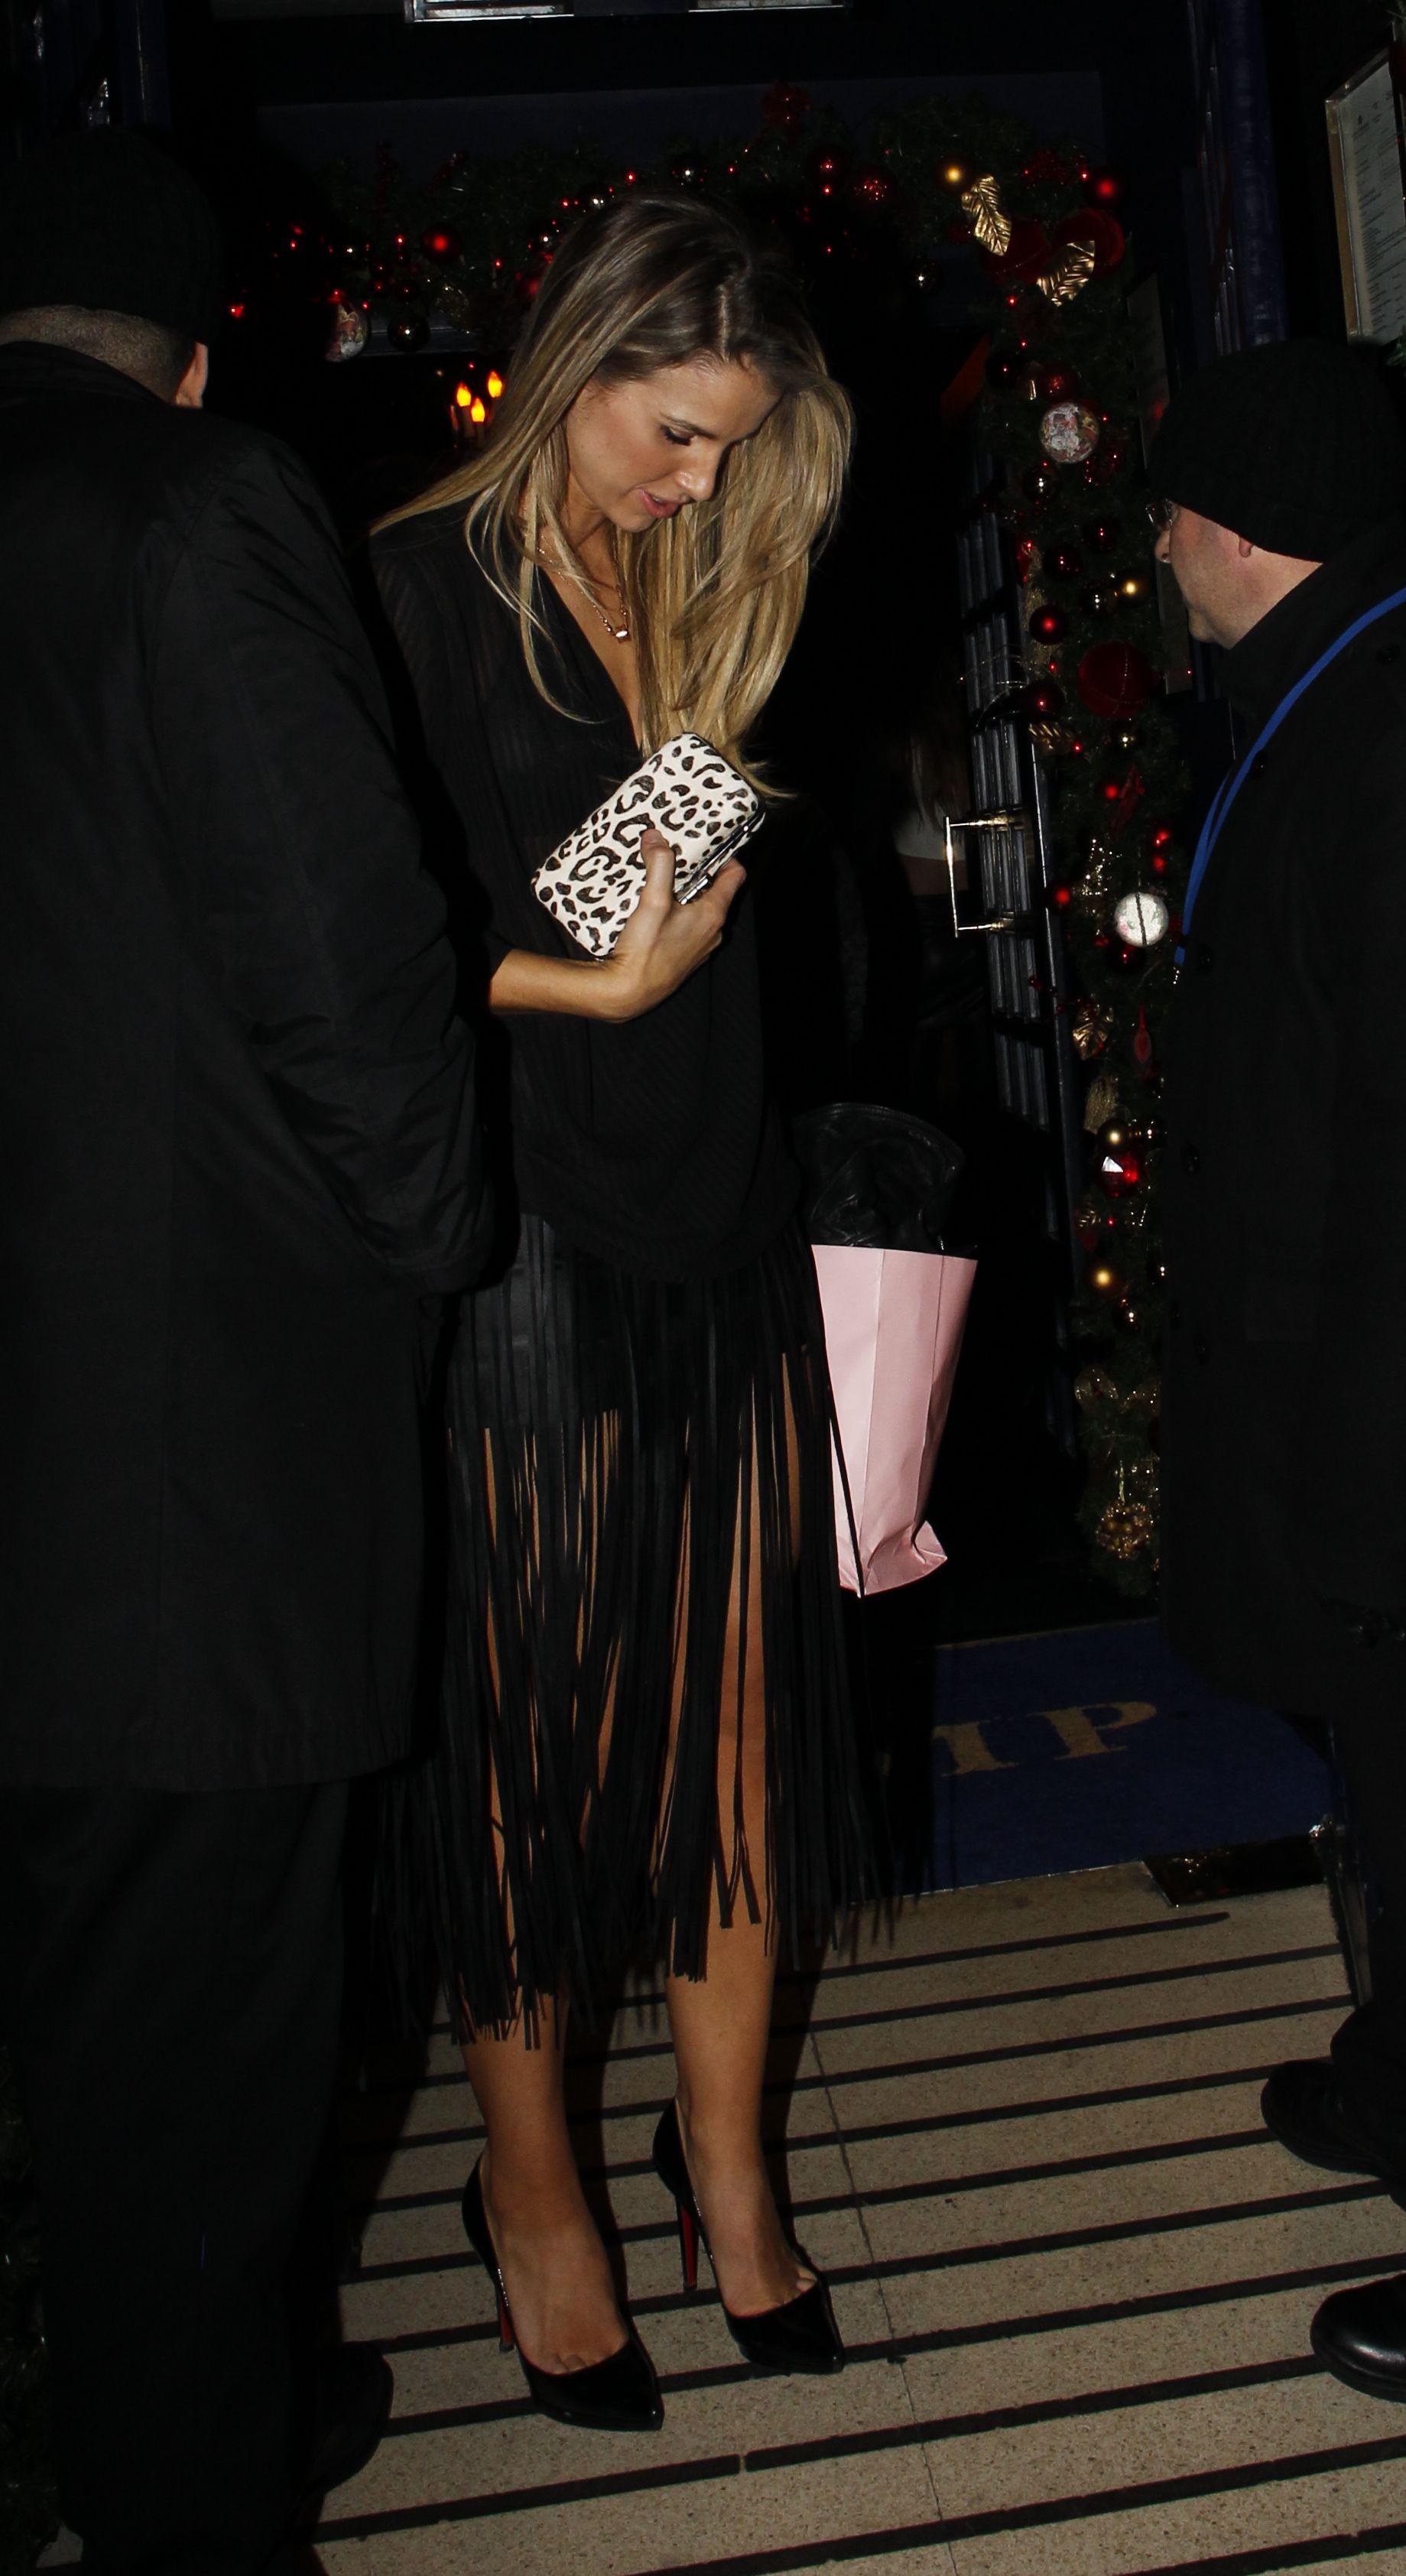 Vogue Williams 2015 : Vogue Williams: Sunday Times STYLE Magazines -09